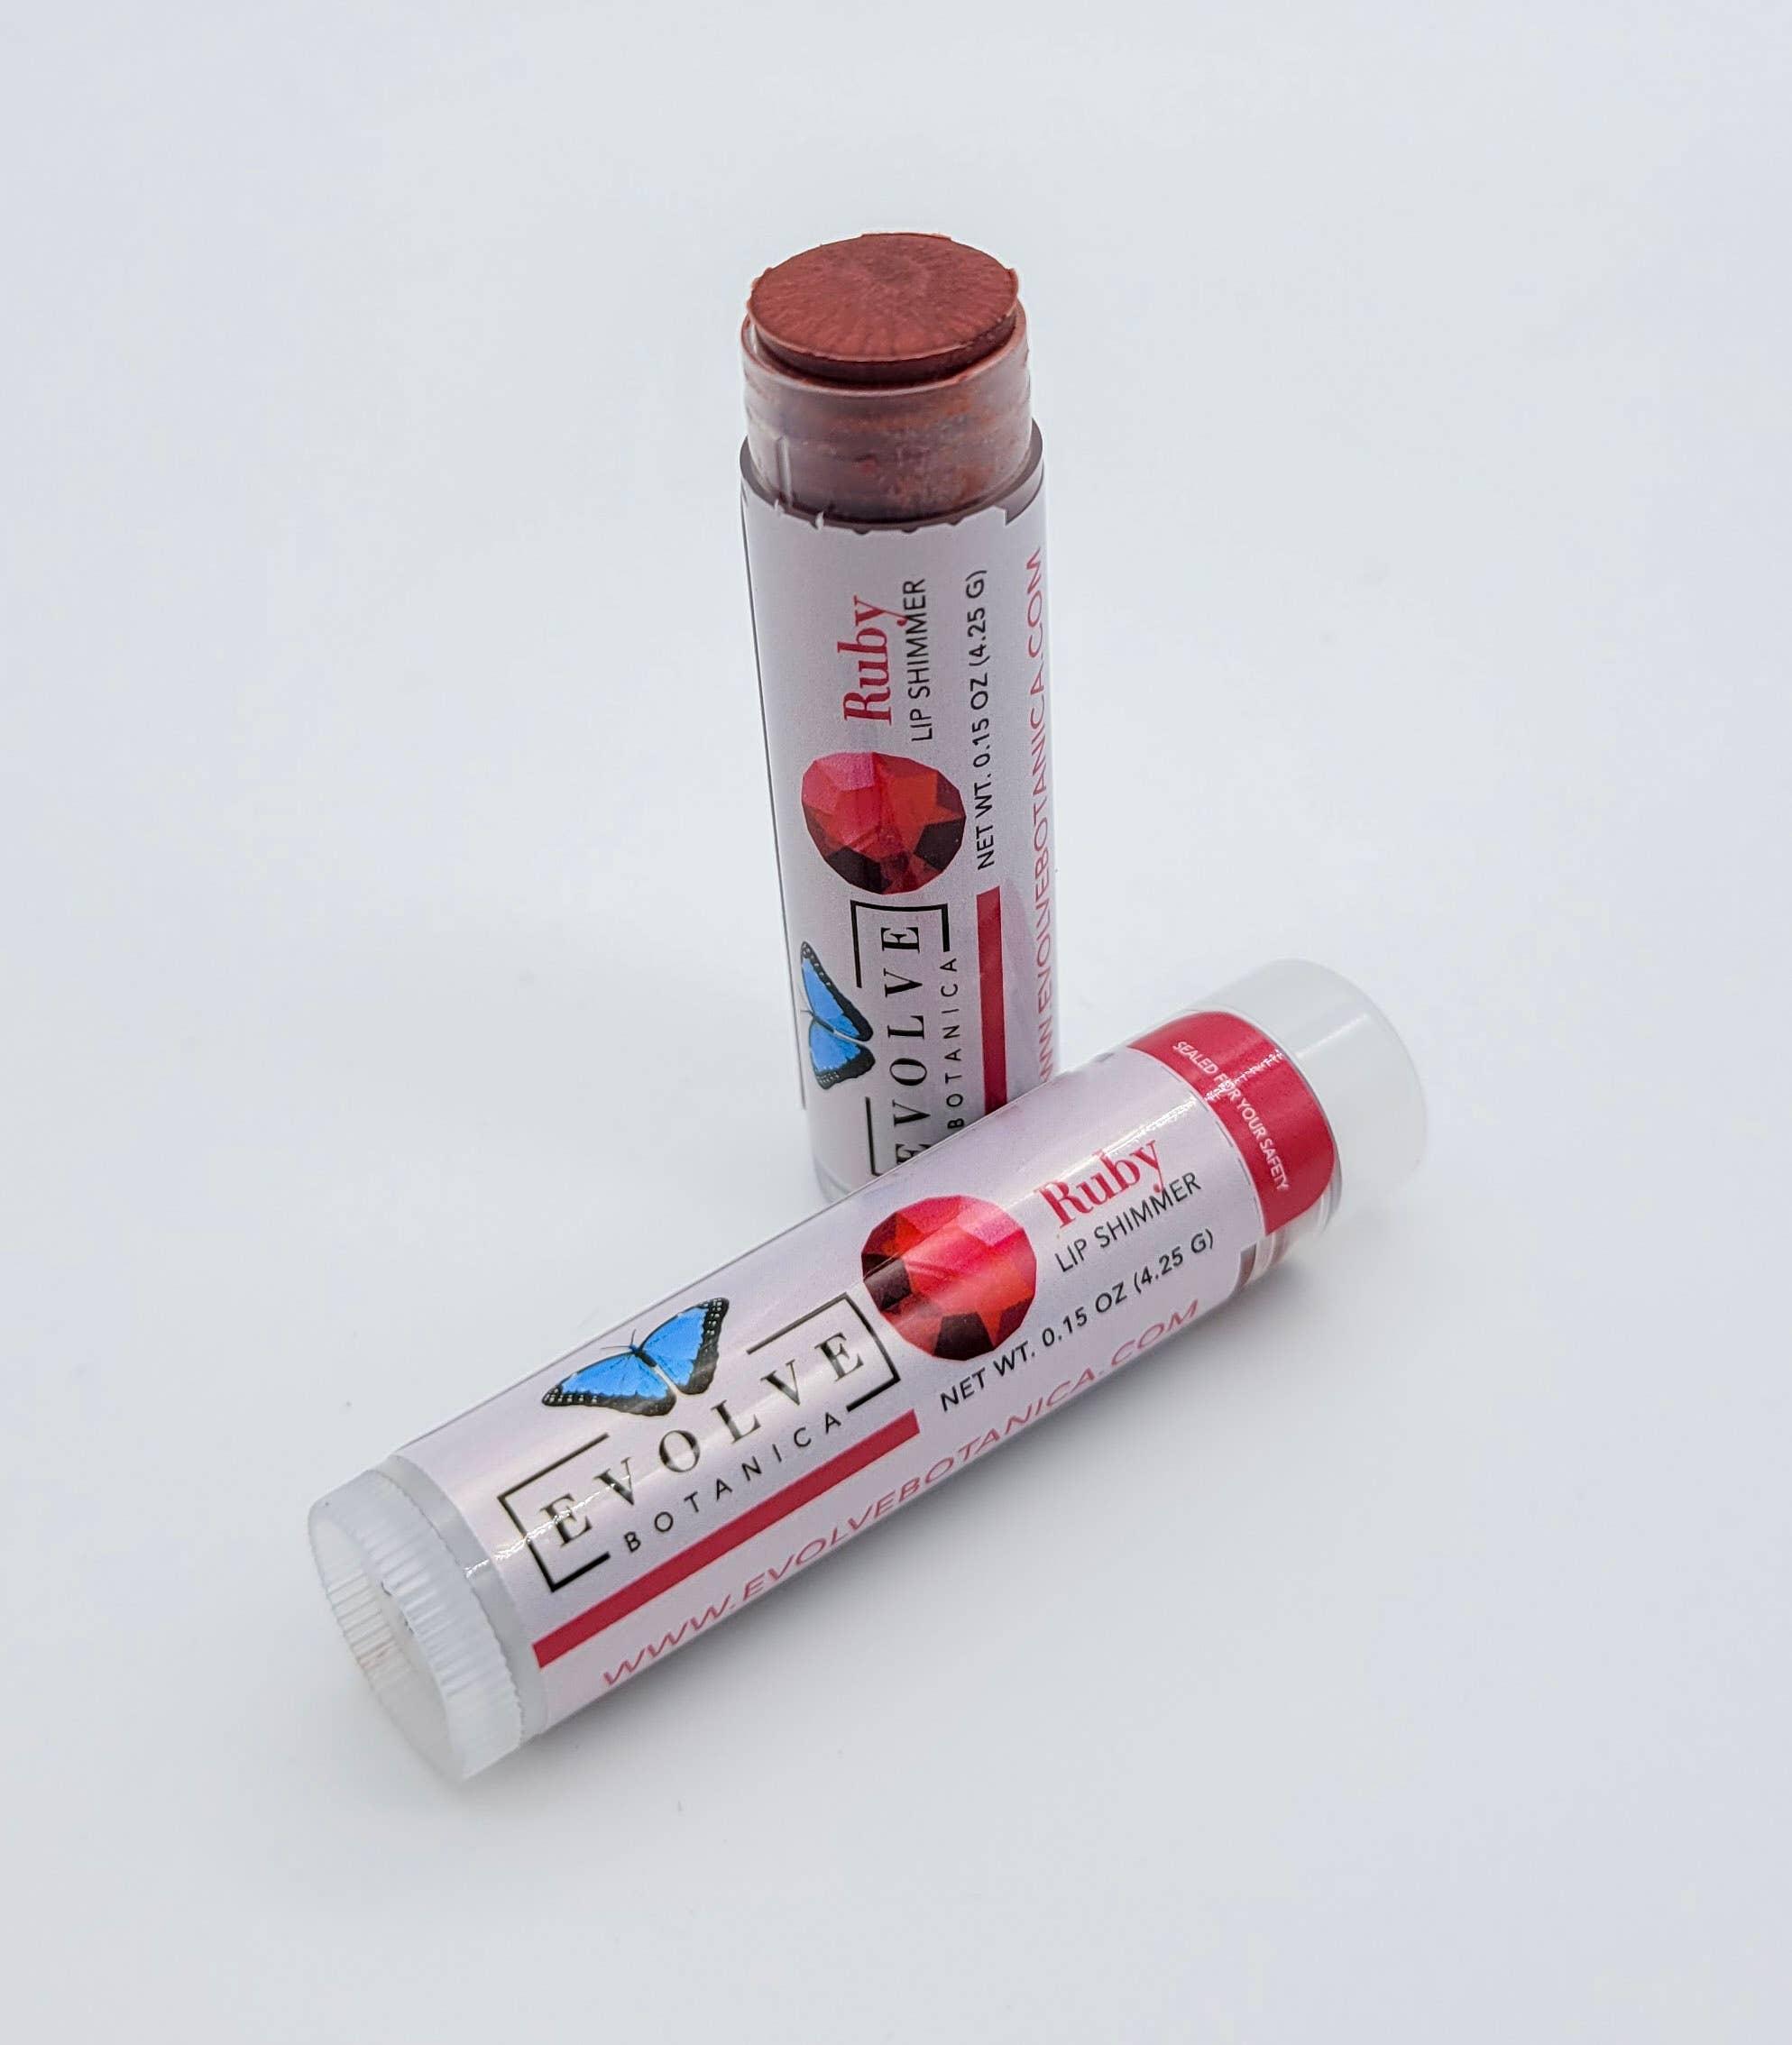 Evolve - Lip Balm - Natural Shimmer Tint - Ruby | Trada Marketplace